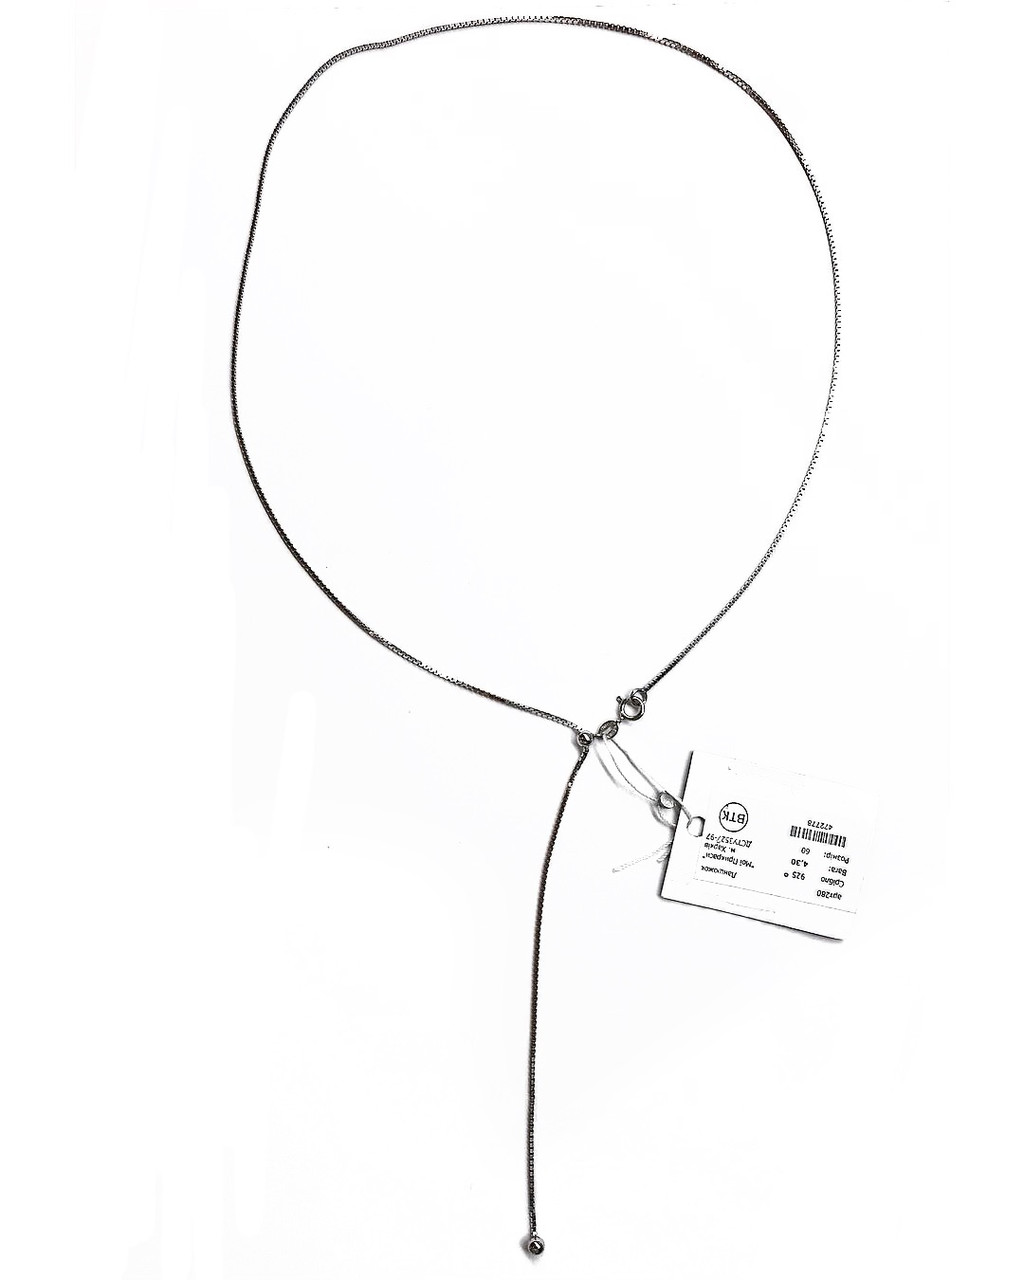 Цепочка из серебра 925 с регулятором длинны Beauty Jewels плетение поп-корн, фото 1